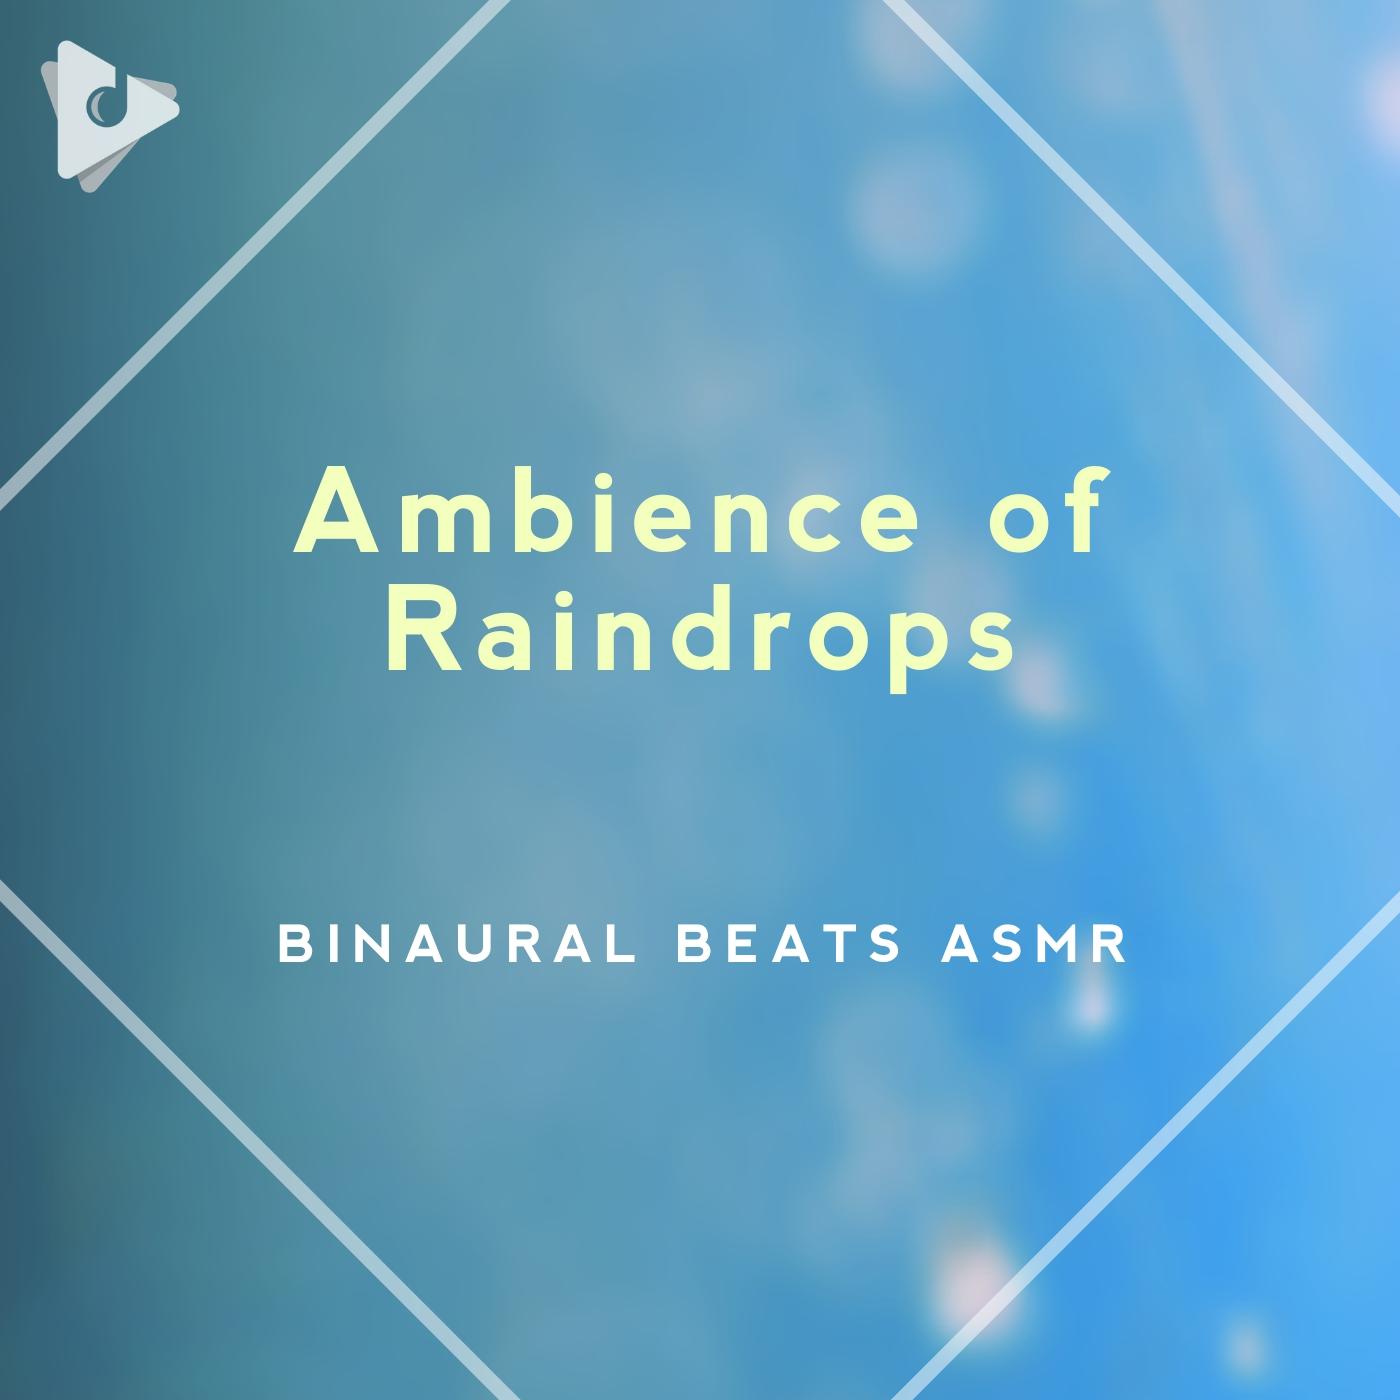 Ambience of Raindrops